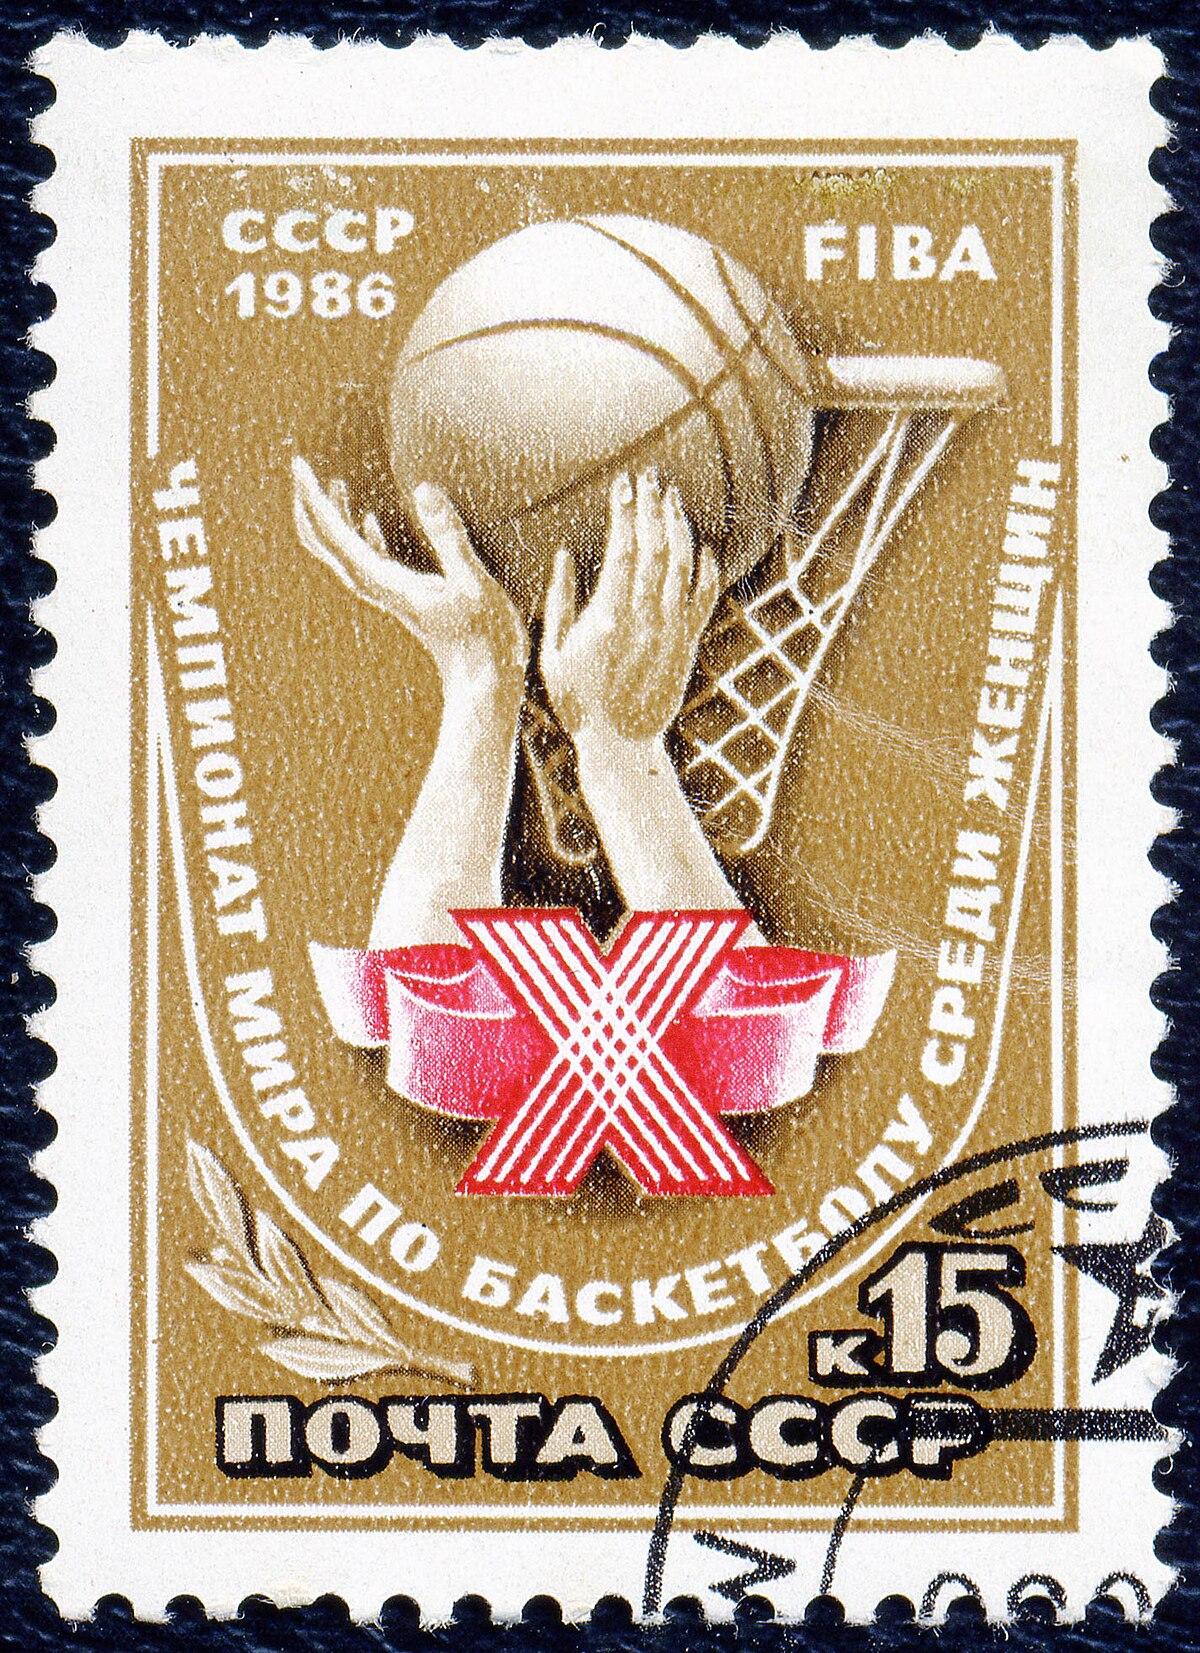 1986 FIBA World Championship For Women Wikipedia